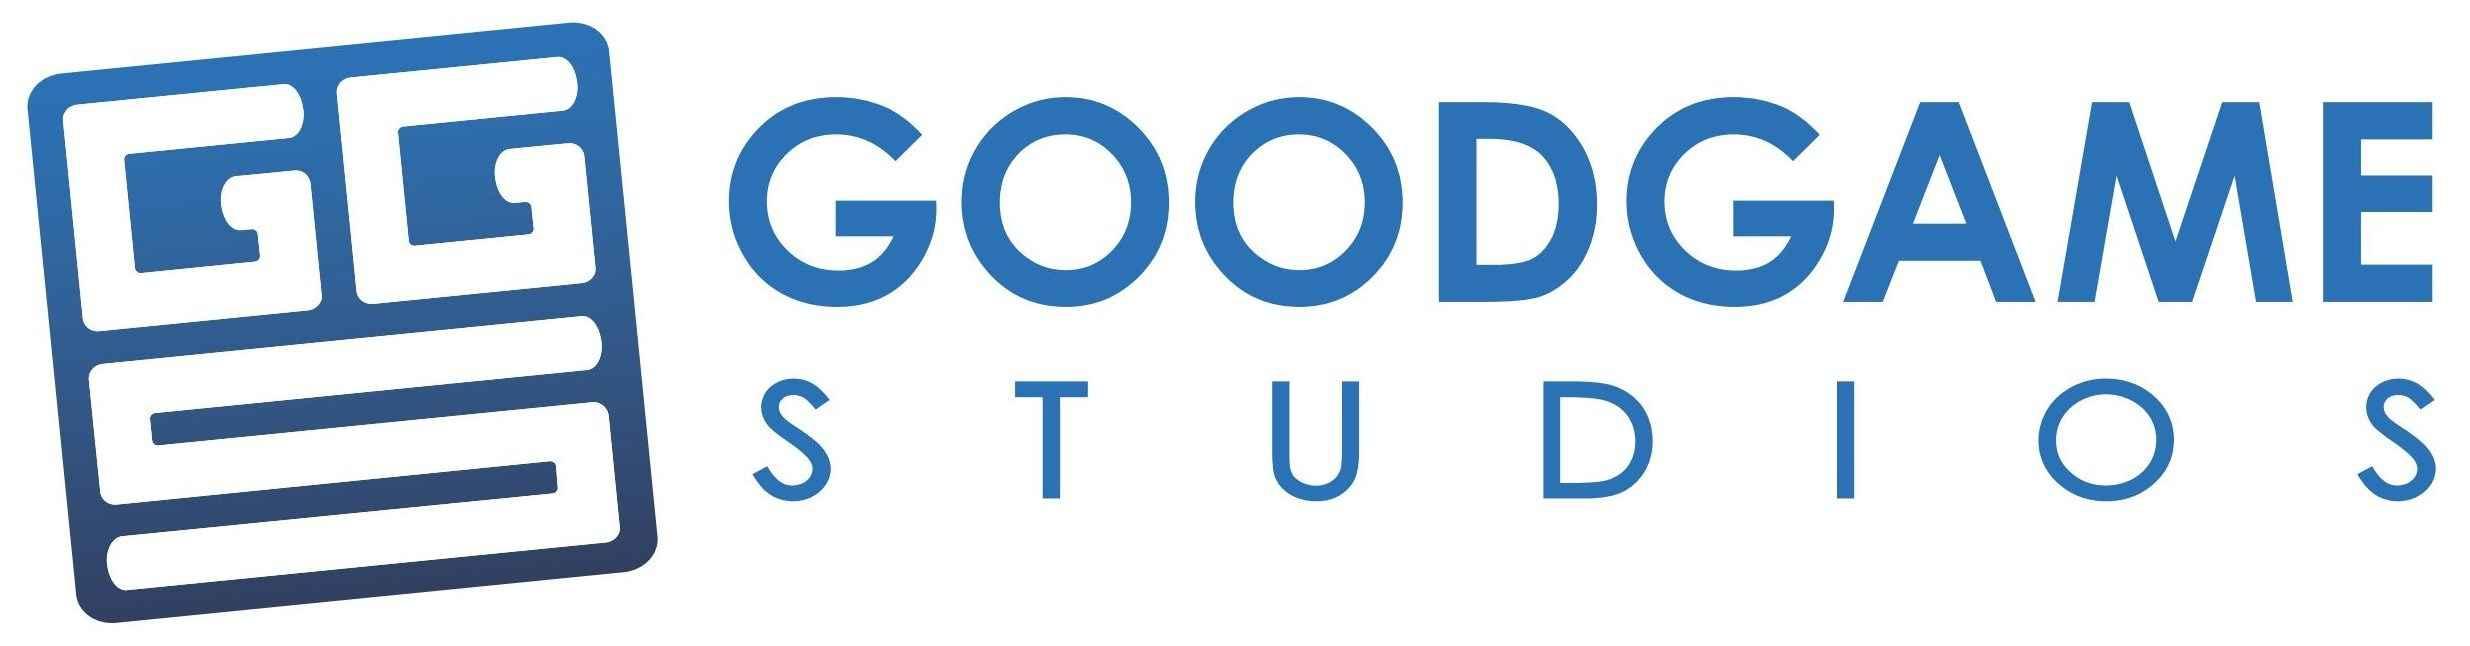 Goodgame Studios Logo png